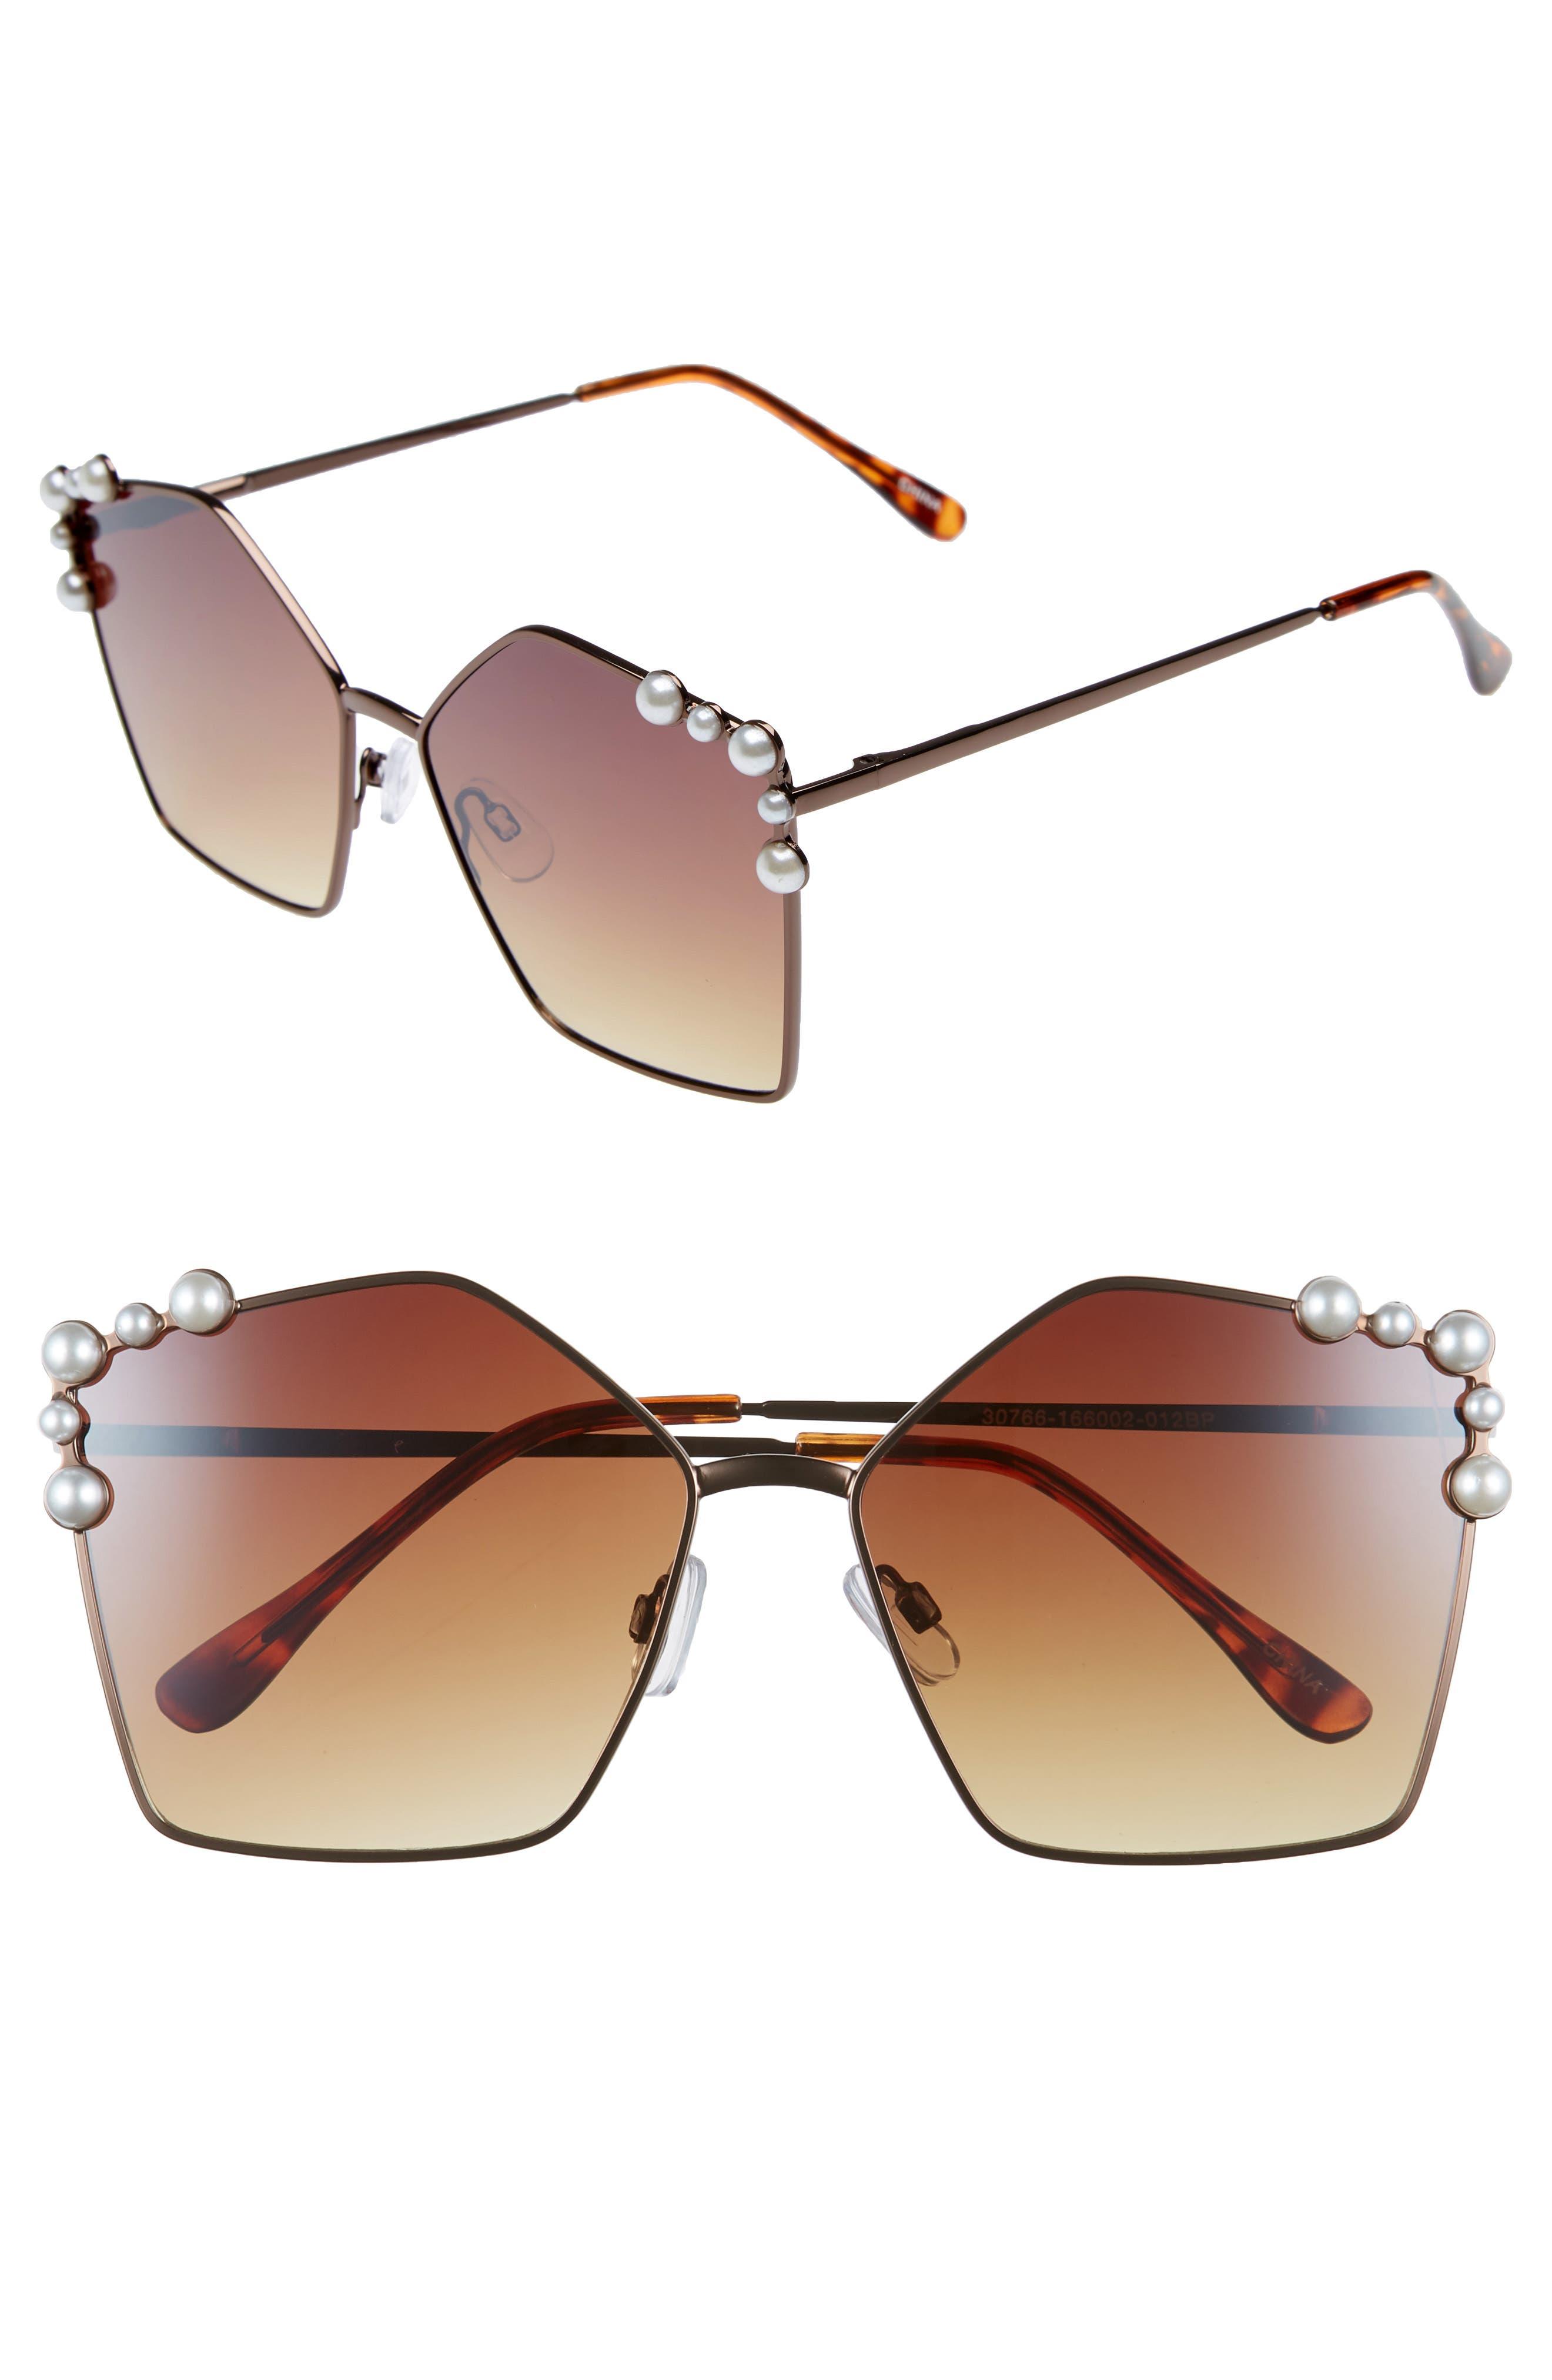 60mm Imitation Pearl Geometric Sunglasses,                         Main,                         color, Brown/ Brown